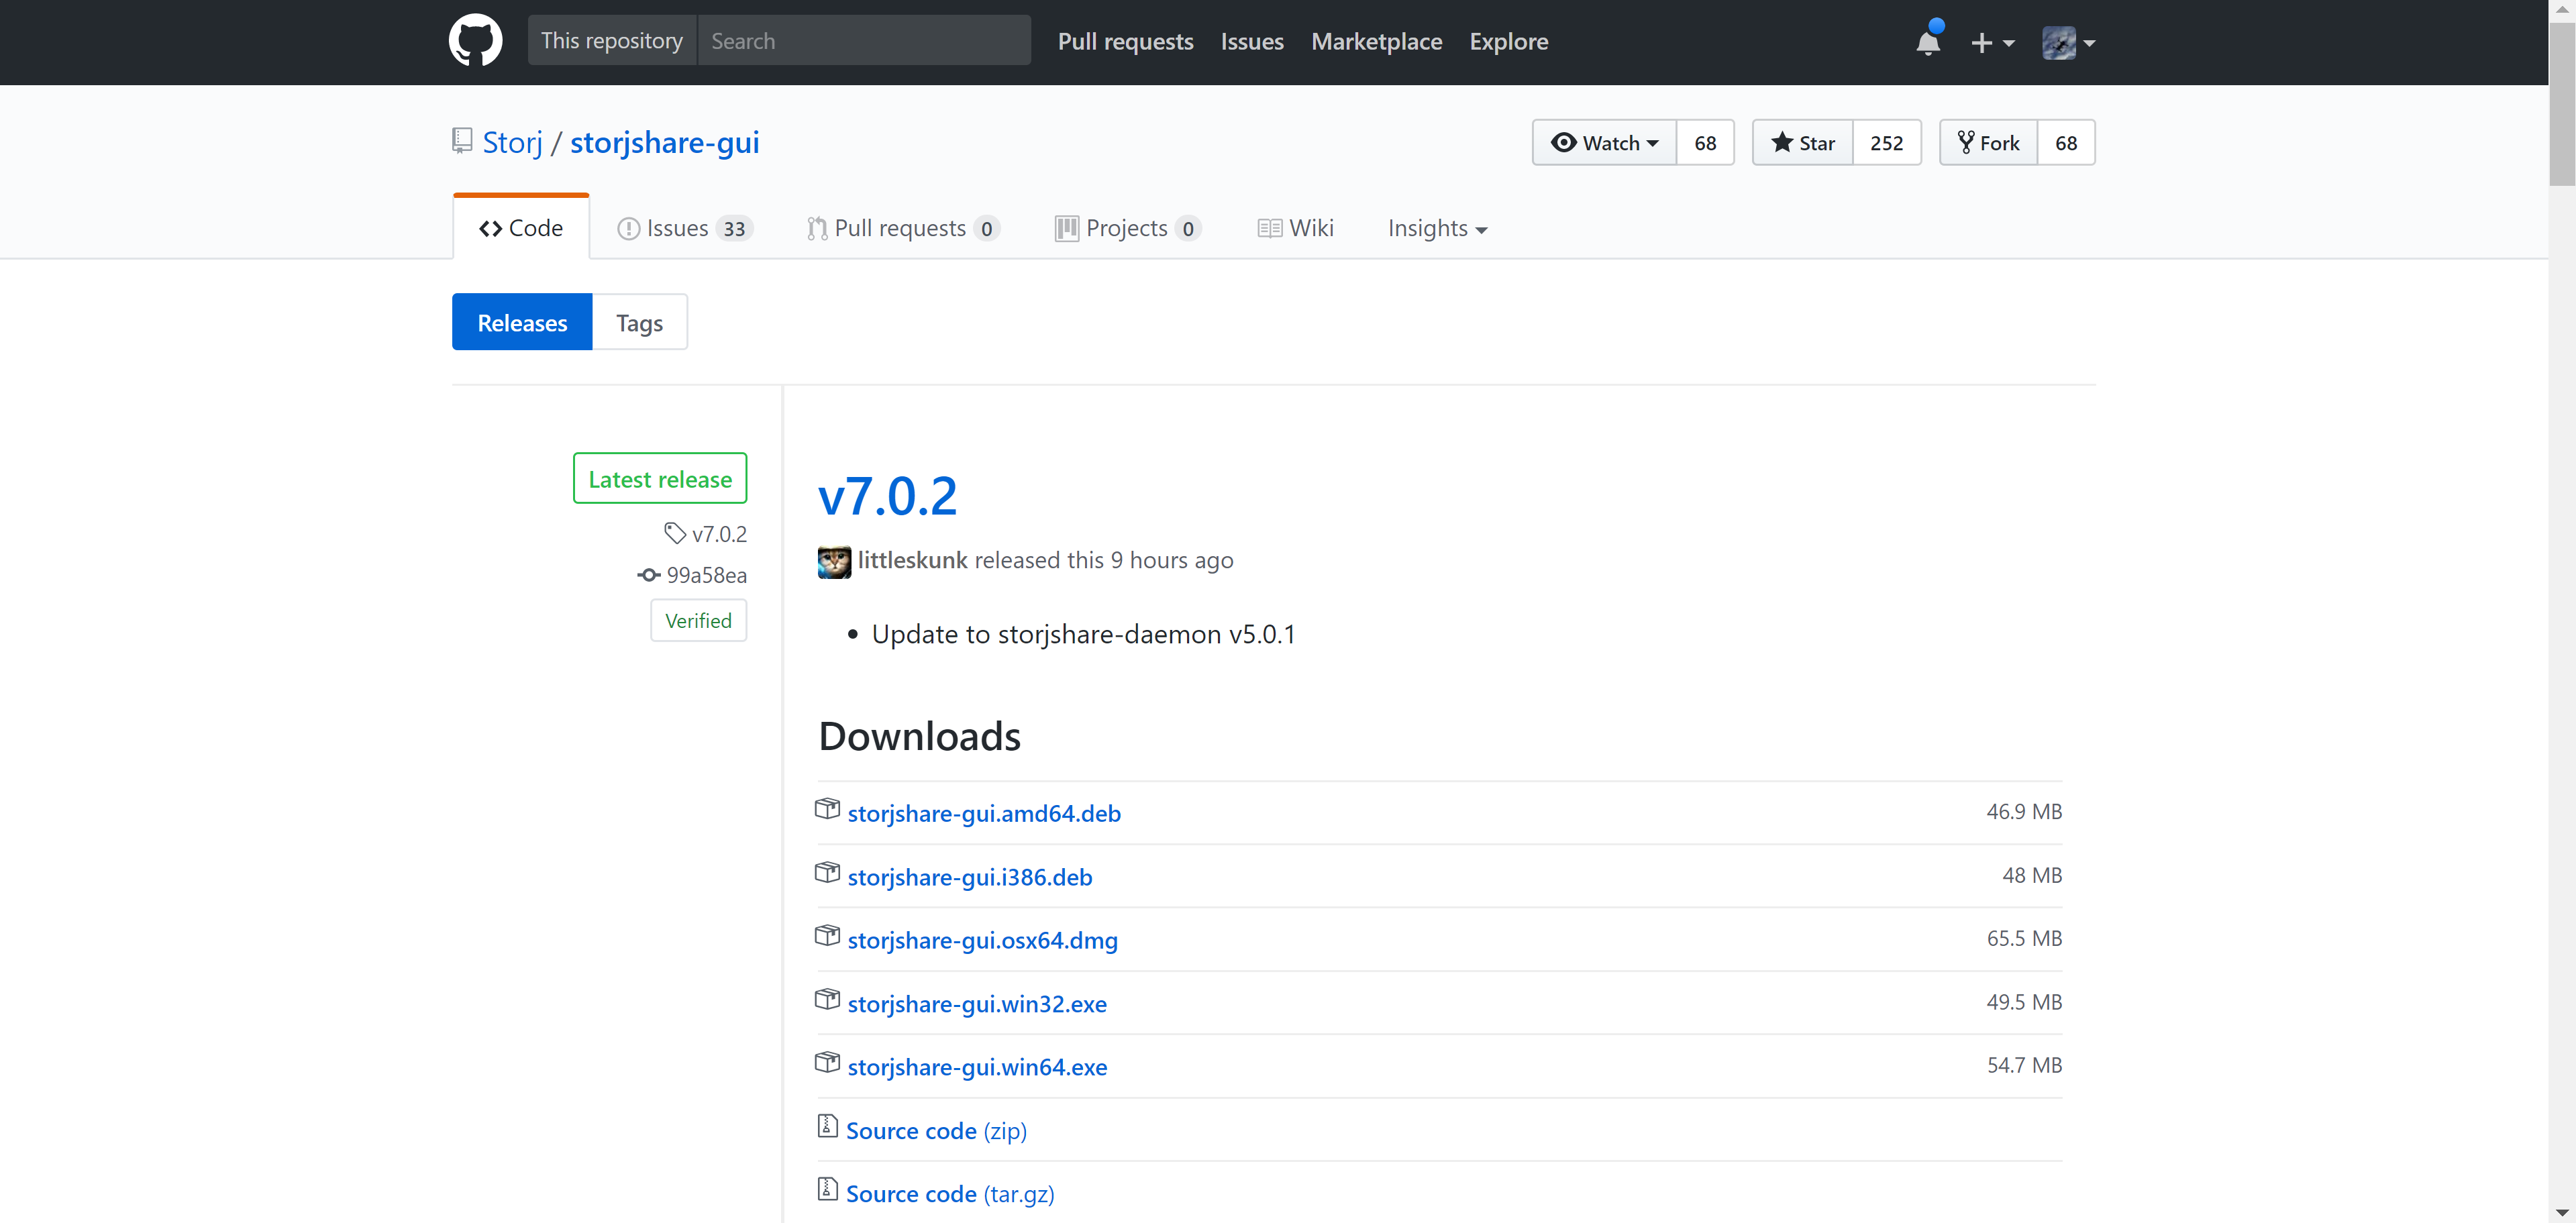 *Figure 2.2. Github Storj Share GUI download page.*